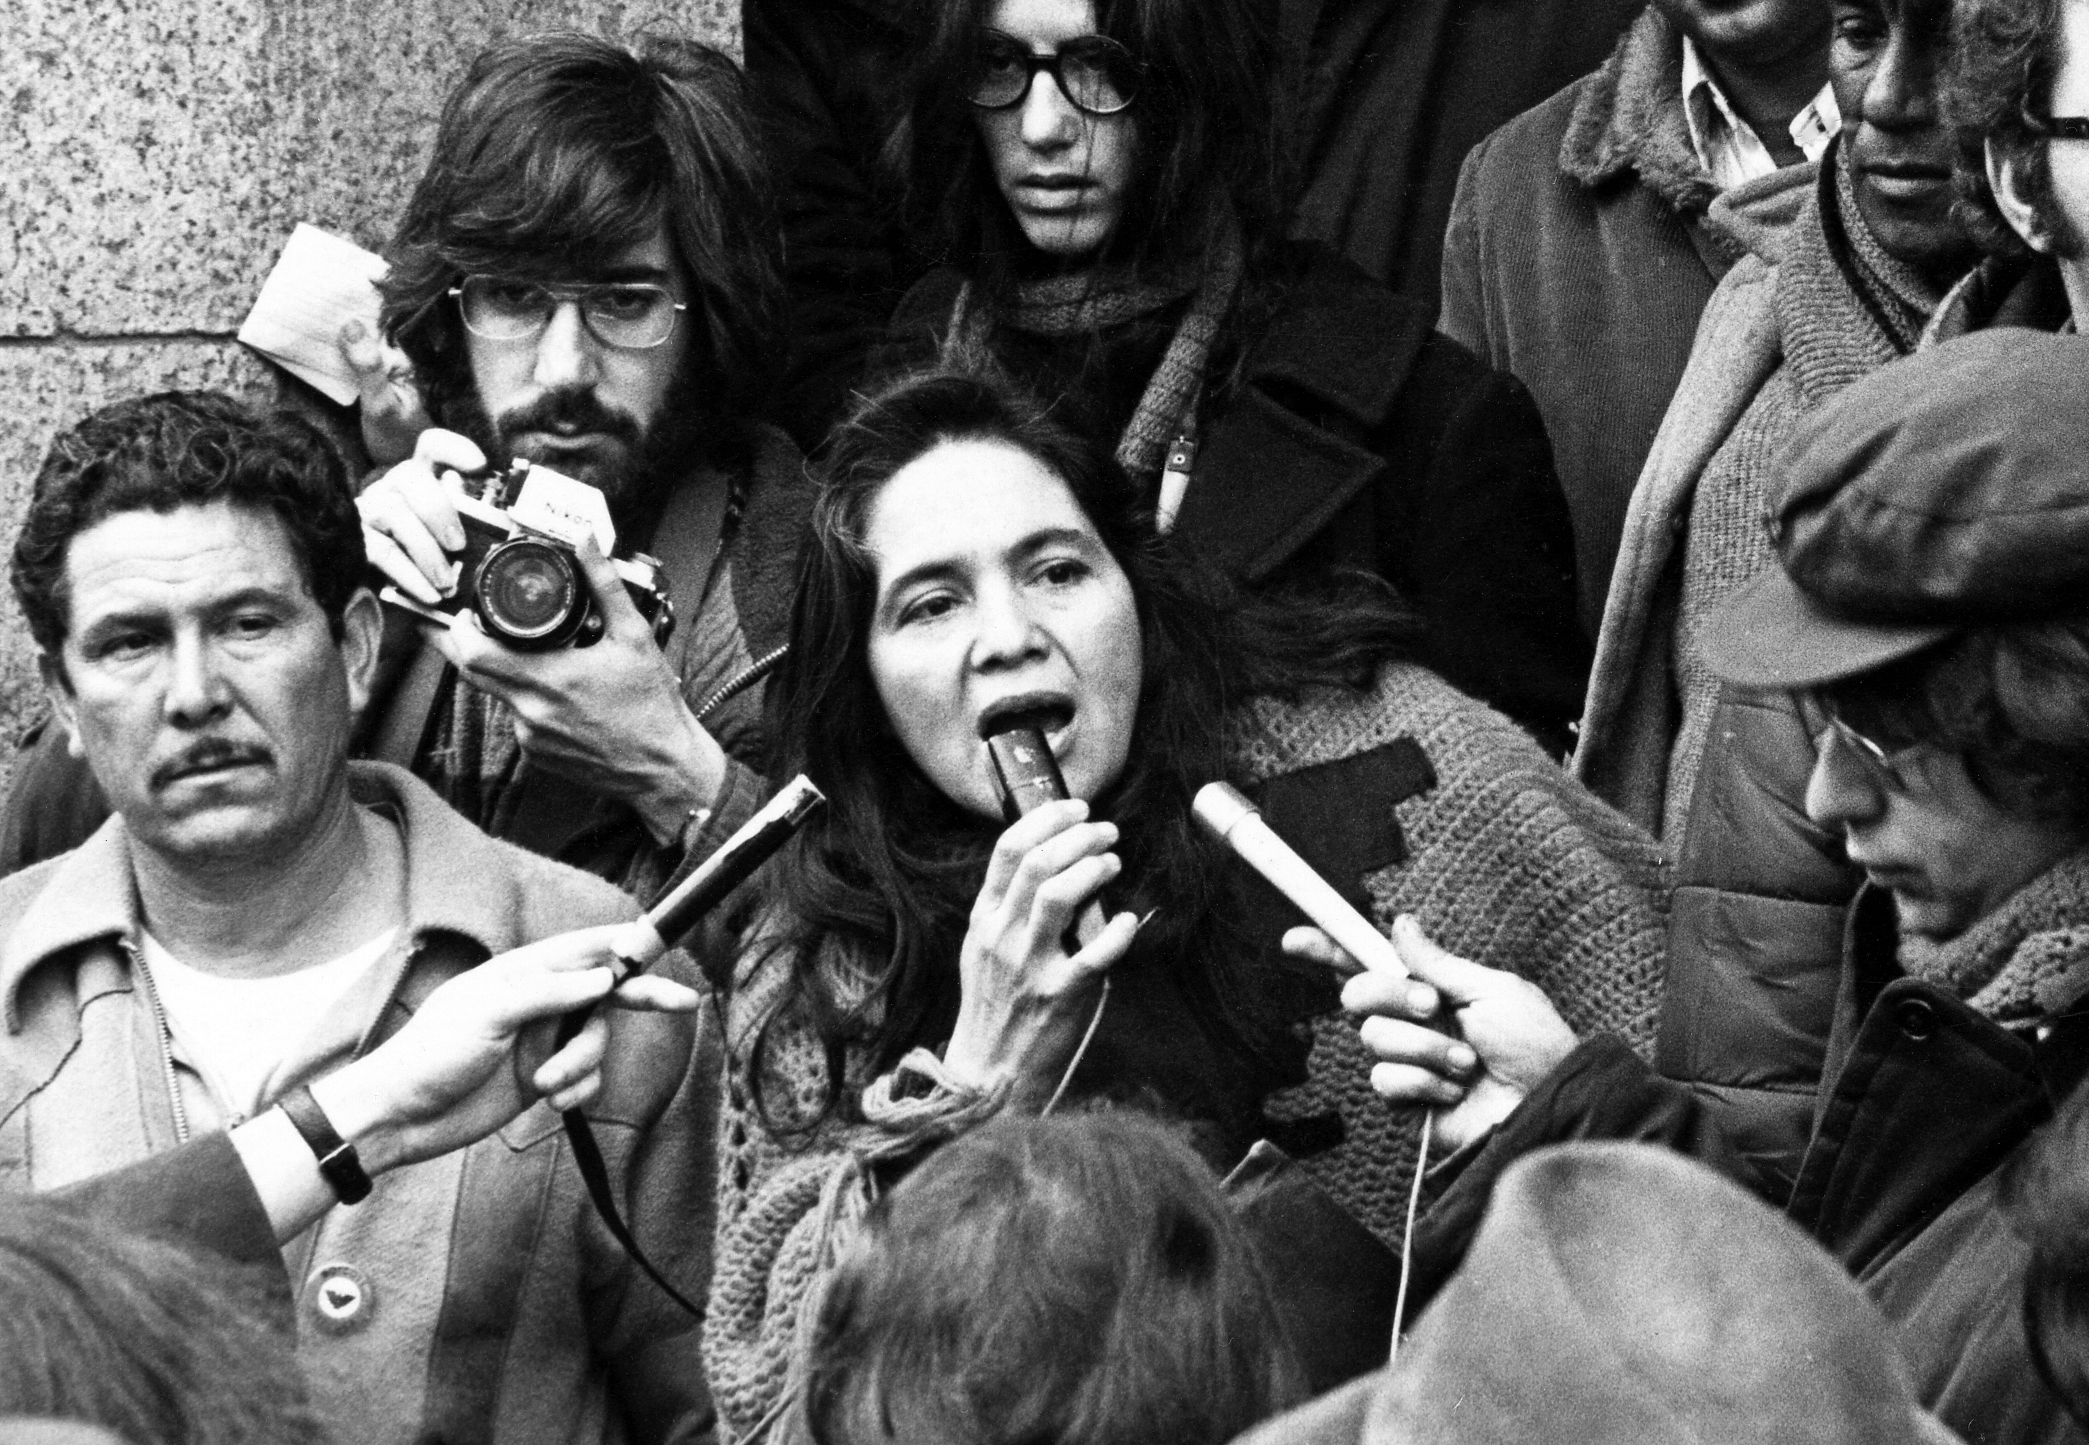 Image: United Farm Workers' Dolores Huerta organizing farm workers in Coachella, California, in 1969